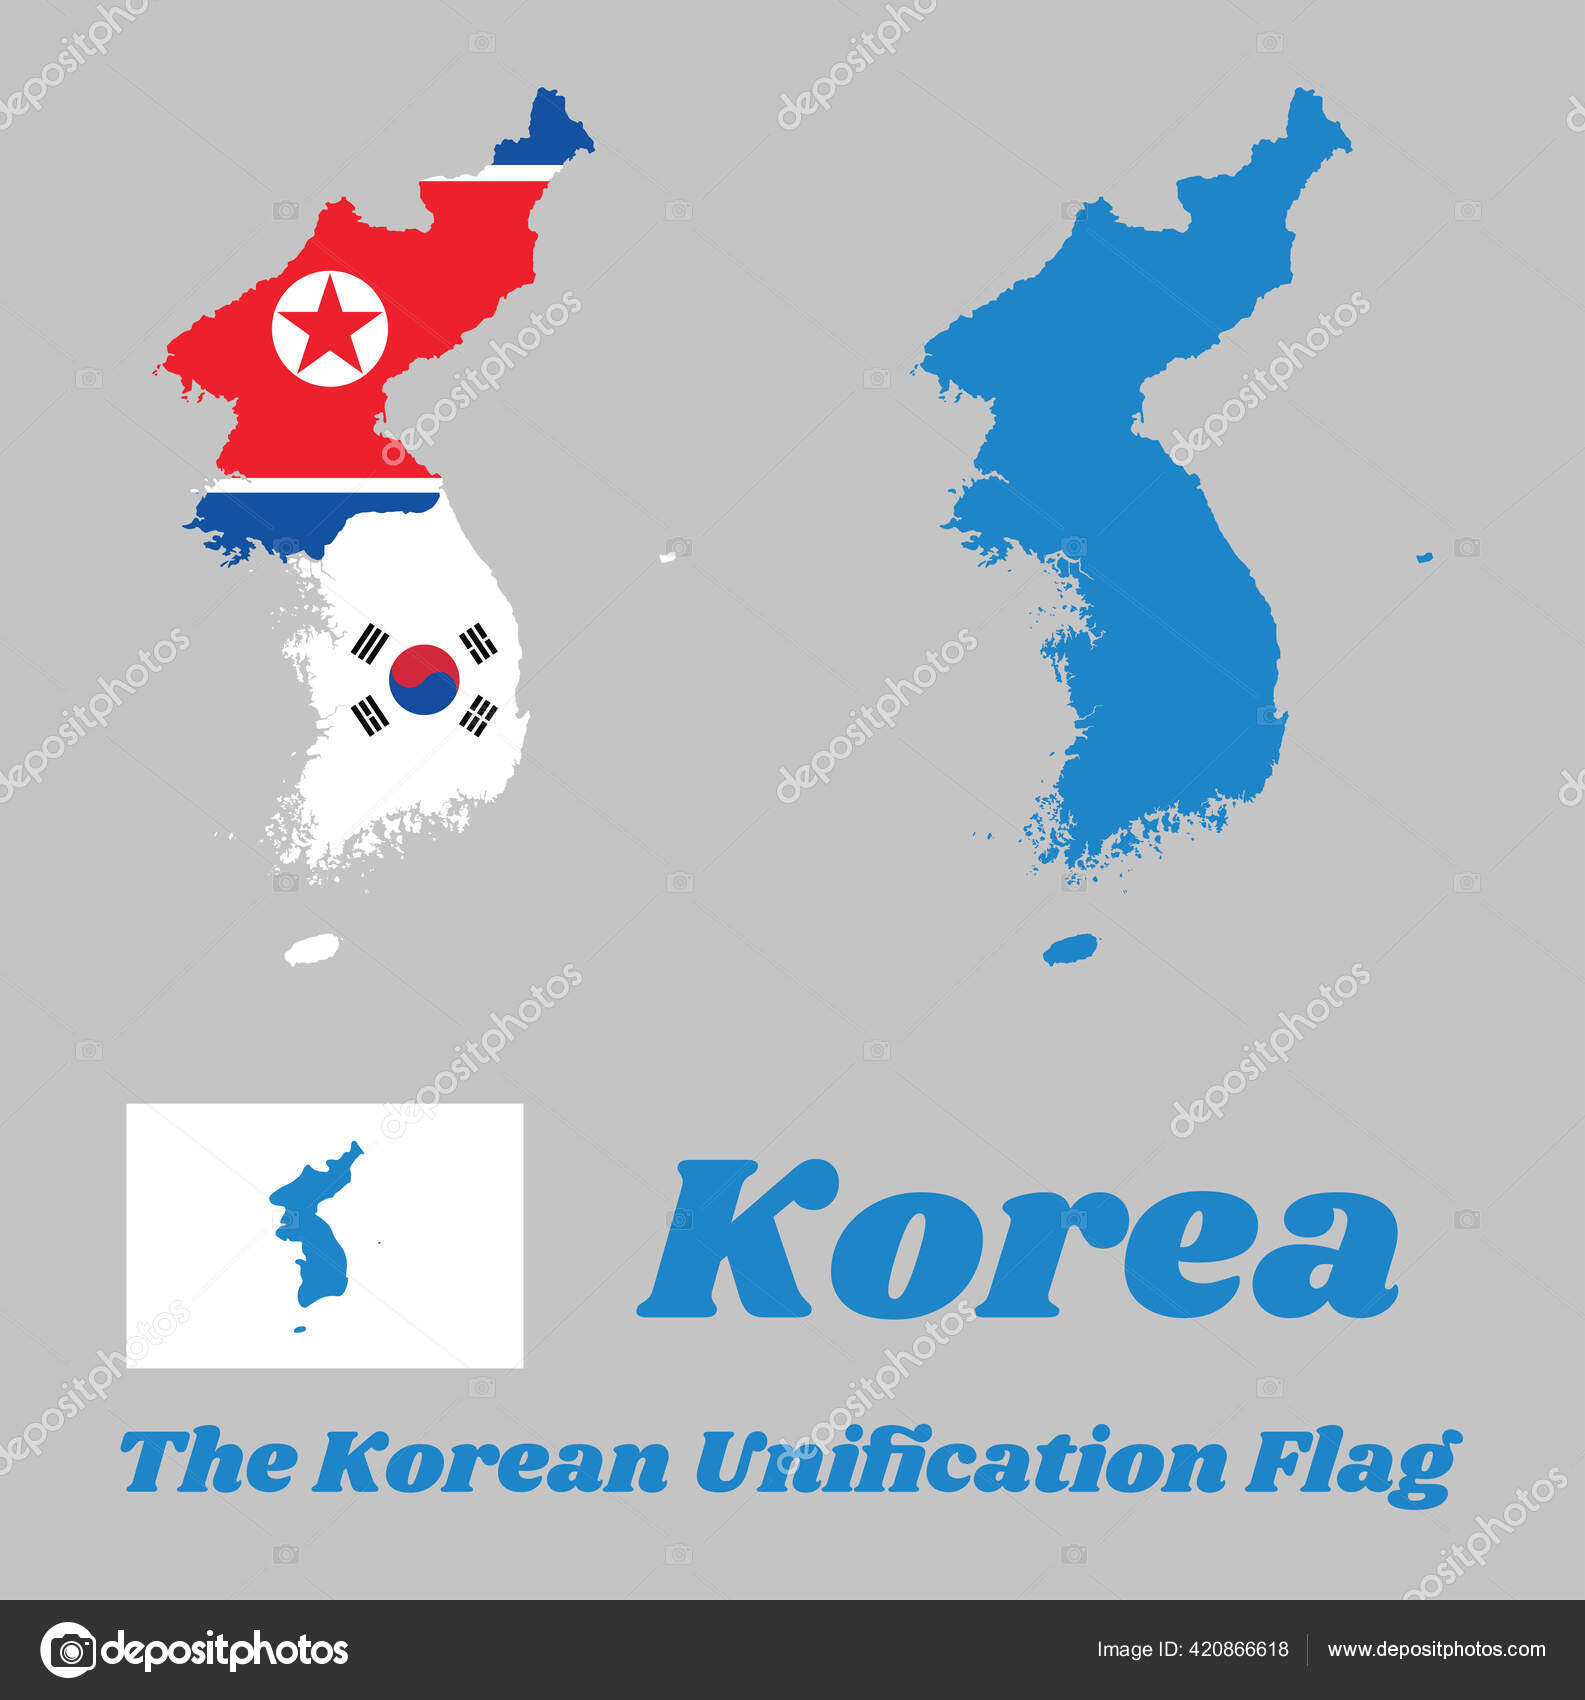 Korean Peninsula Stock Vectors Royalty Free Korean Peninsula Illustrations Depositphotos